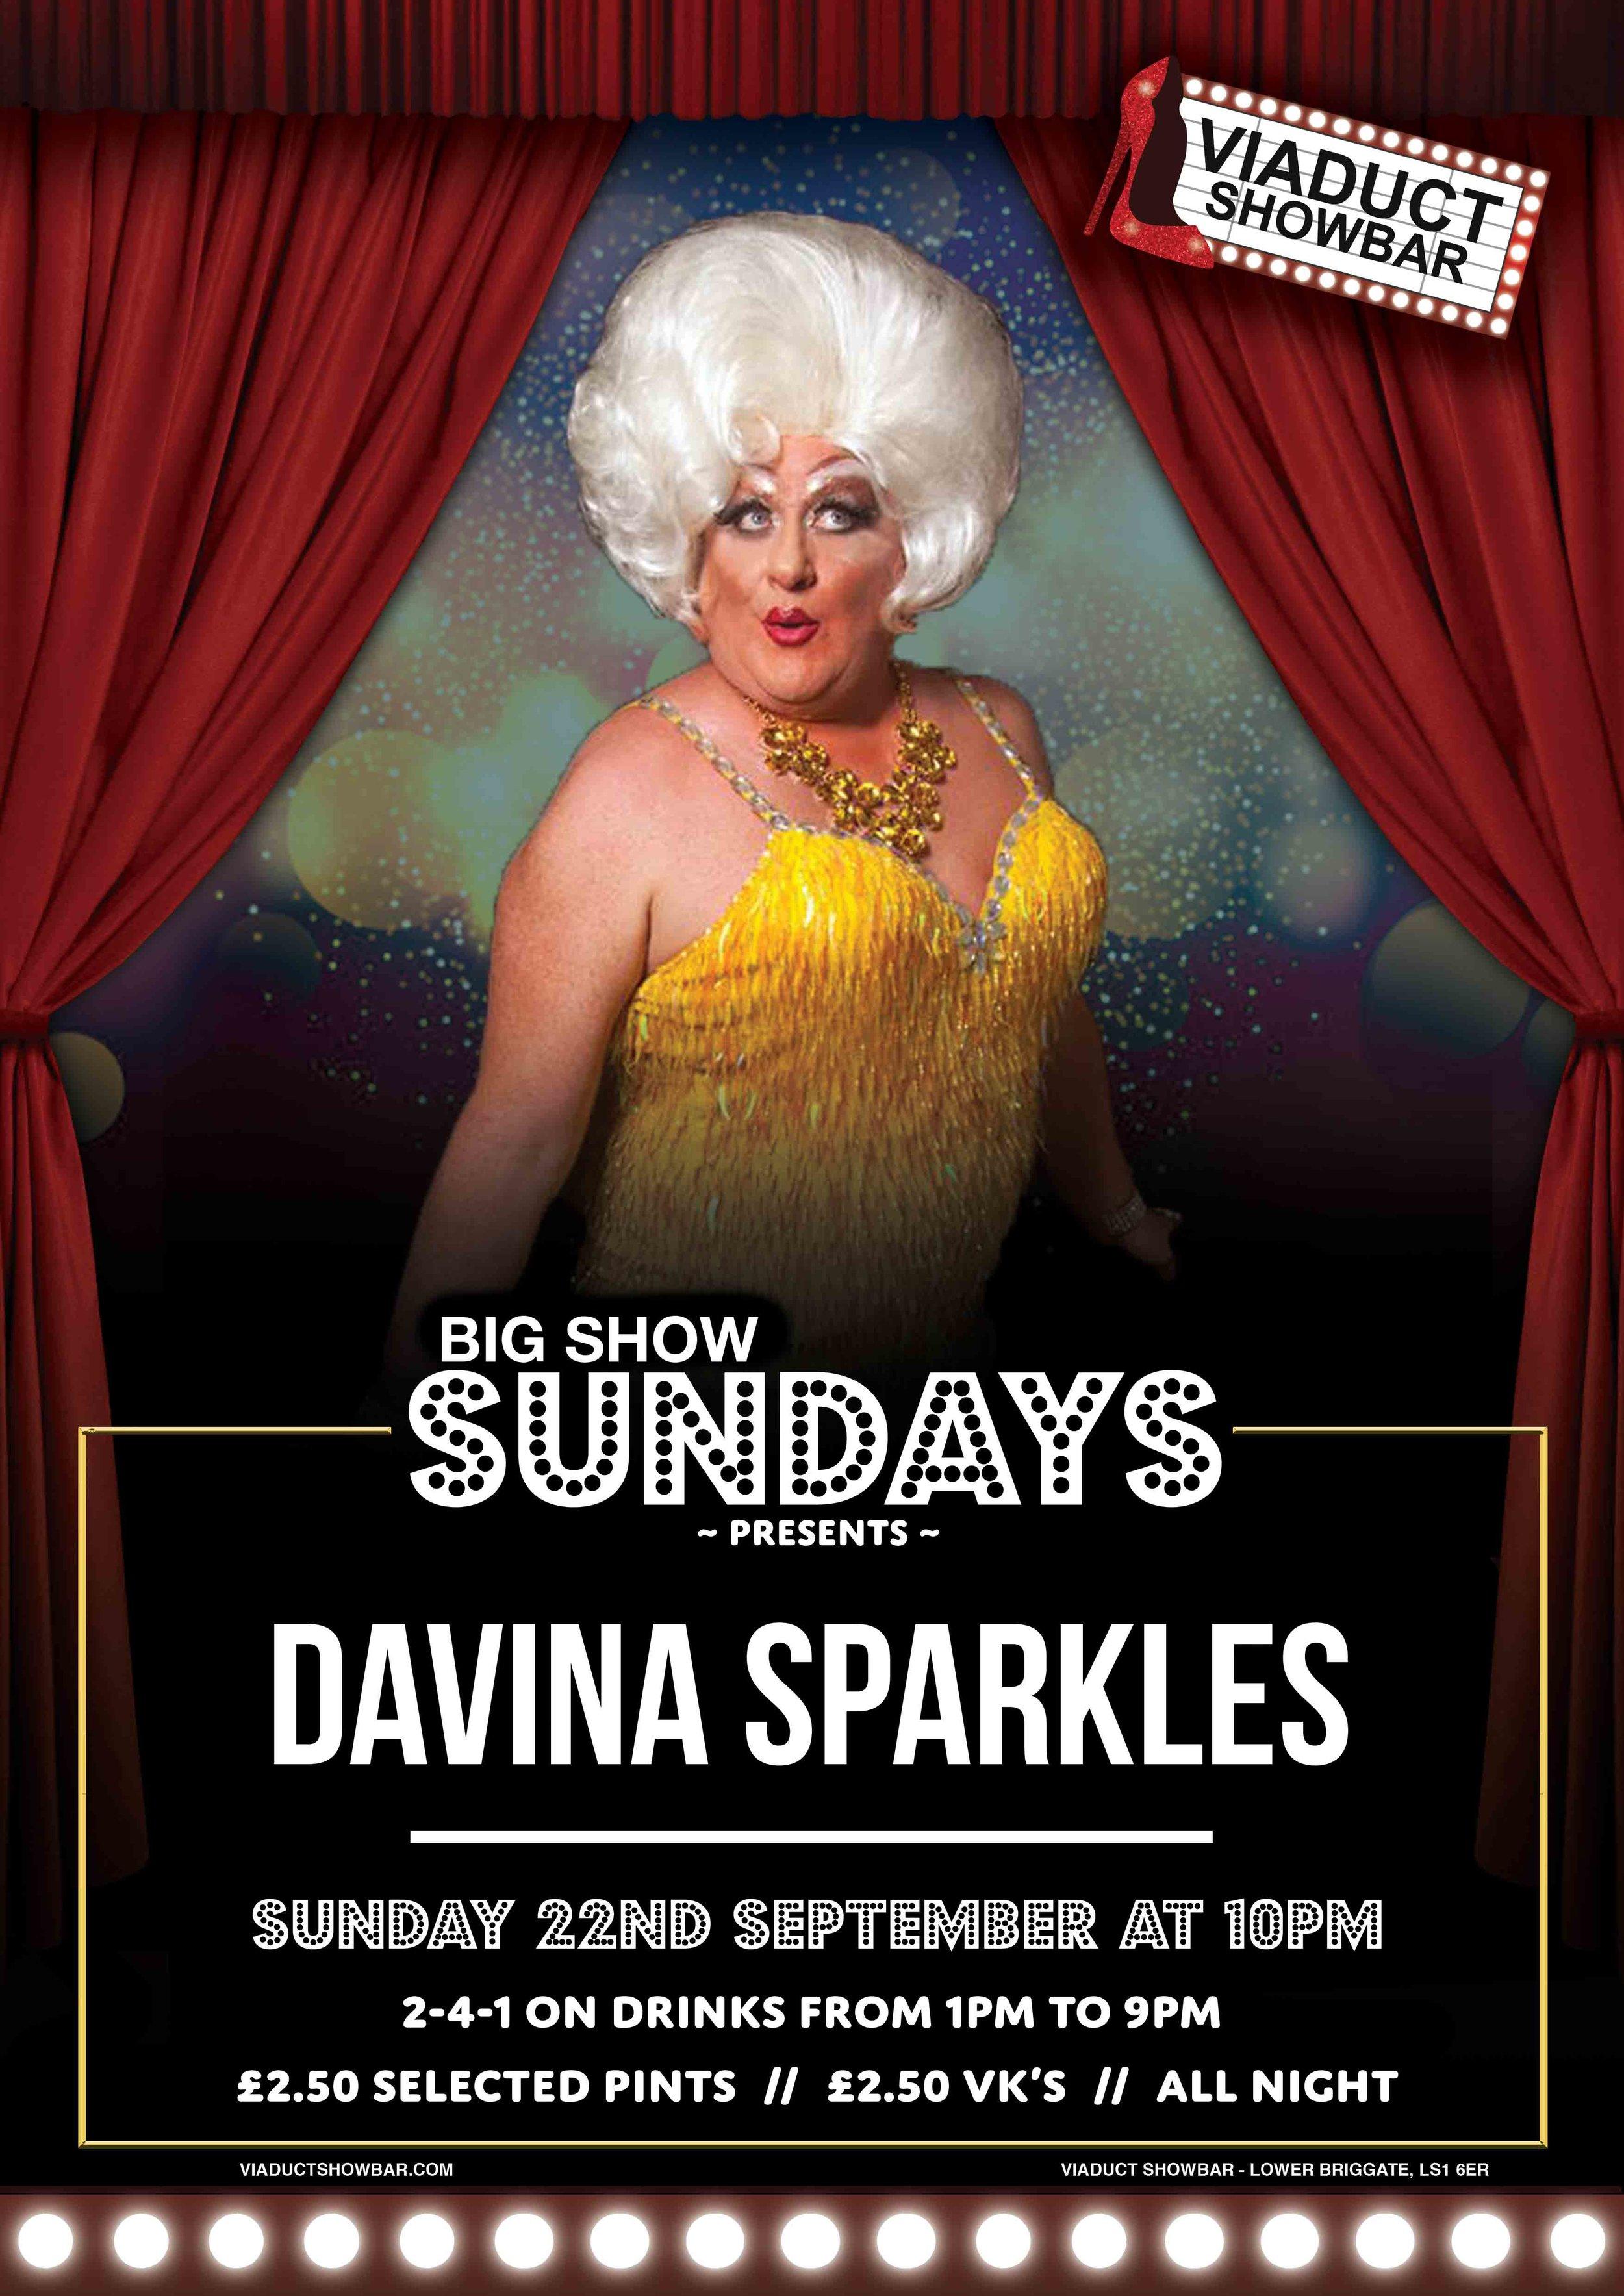 WEB-Davina-Sparkles-22nd-September.jpg